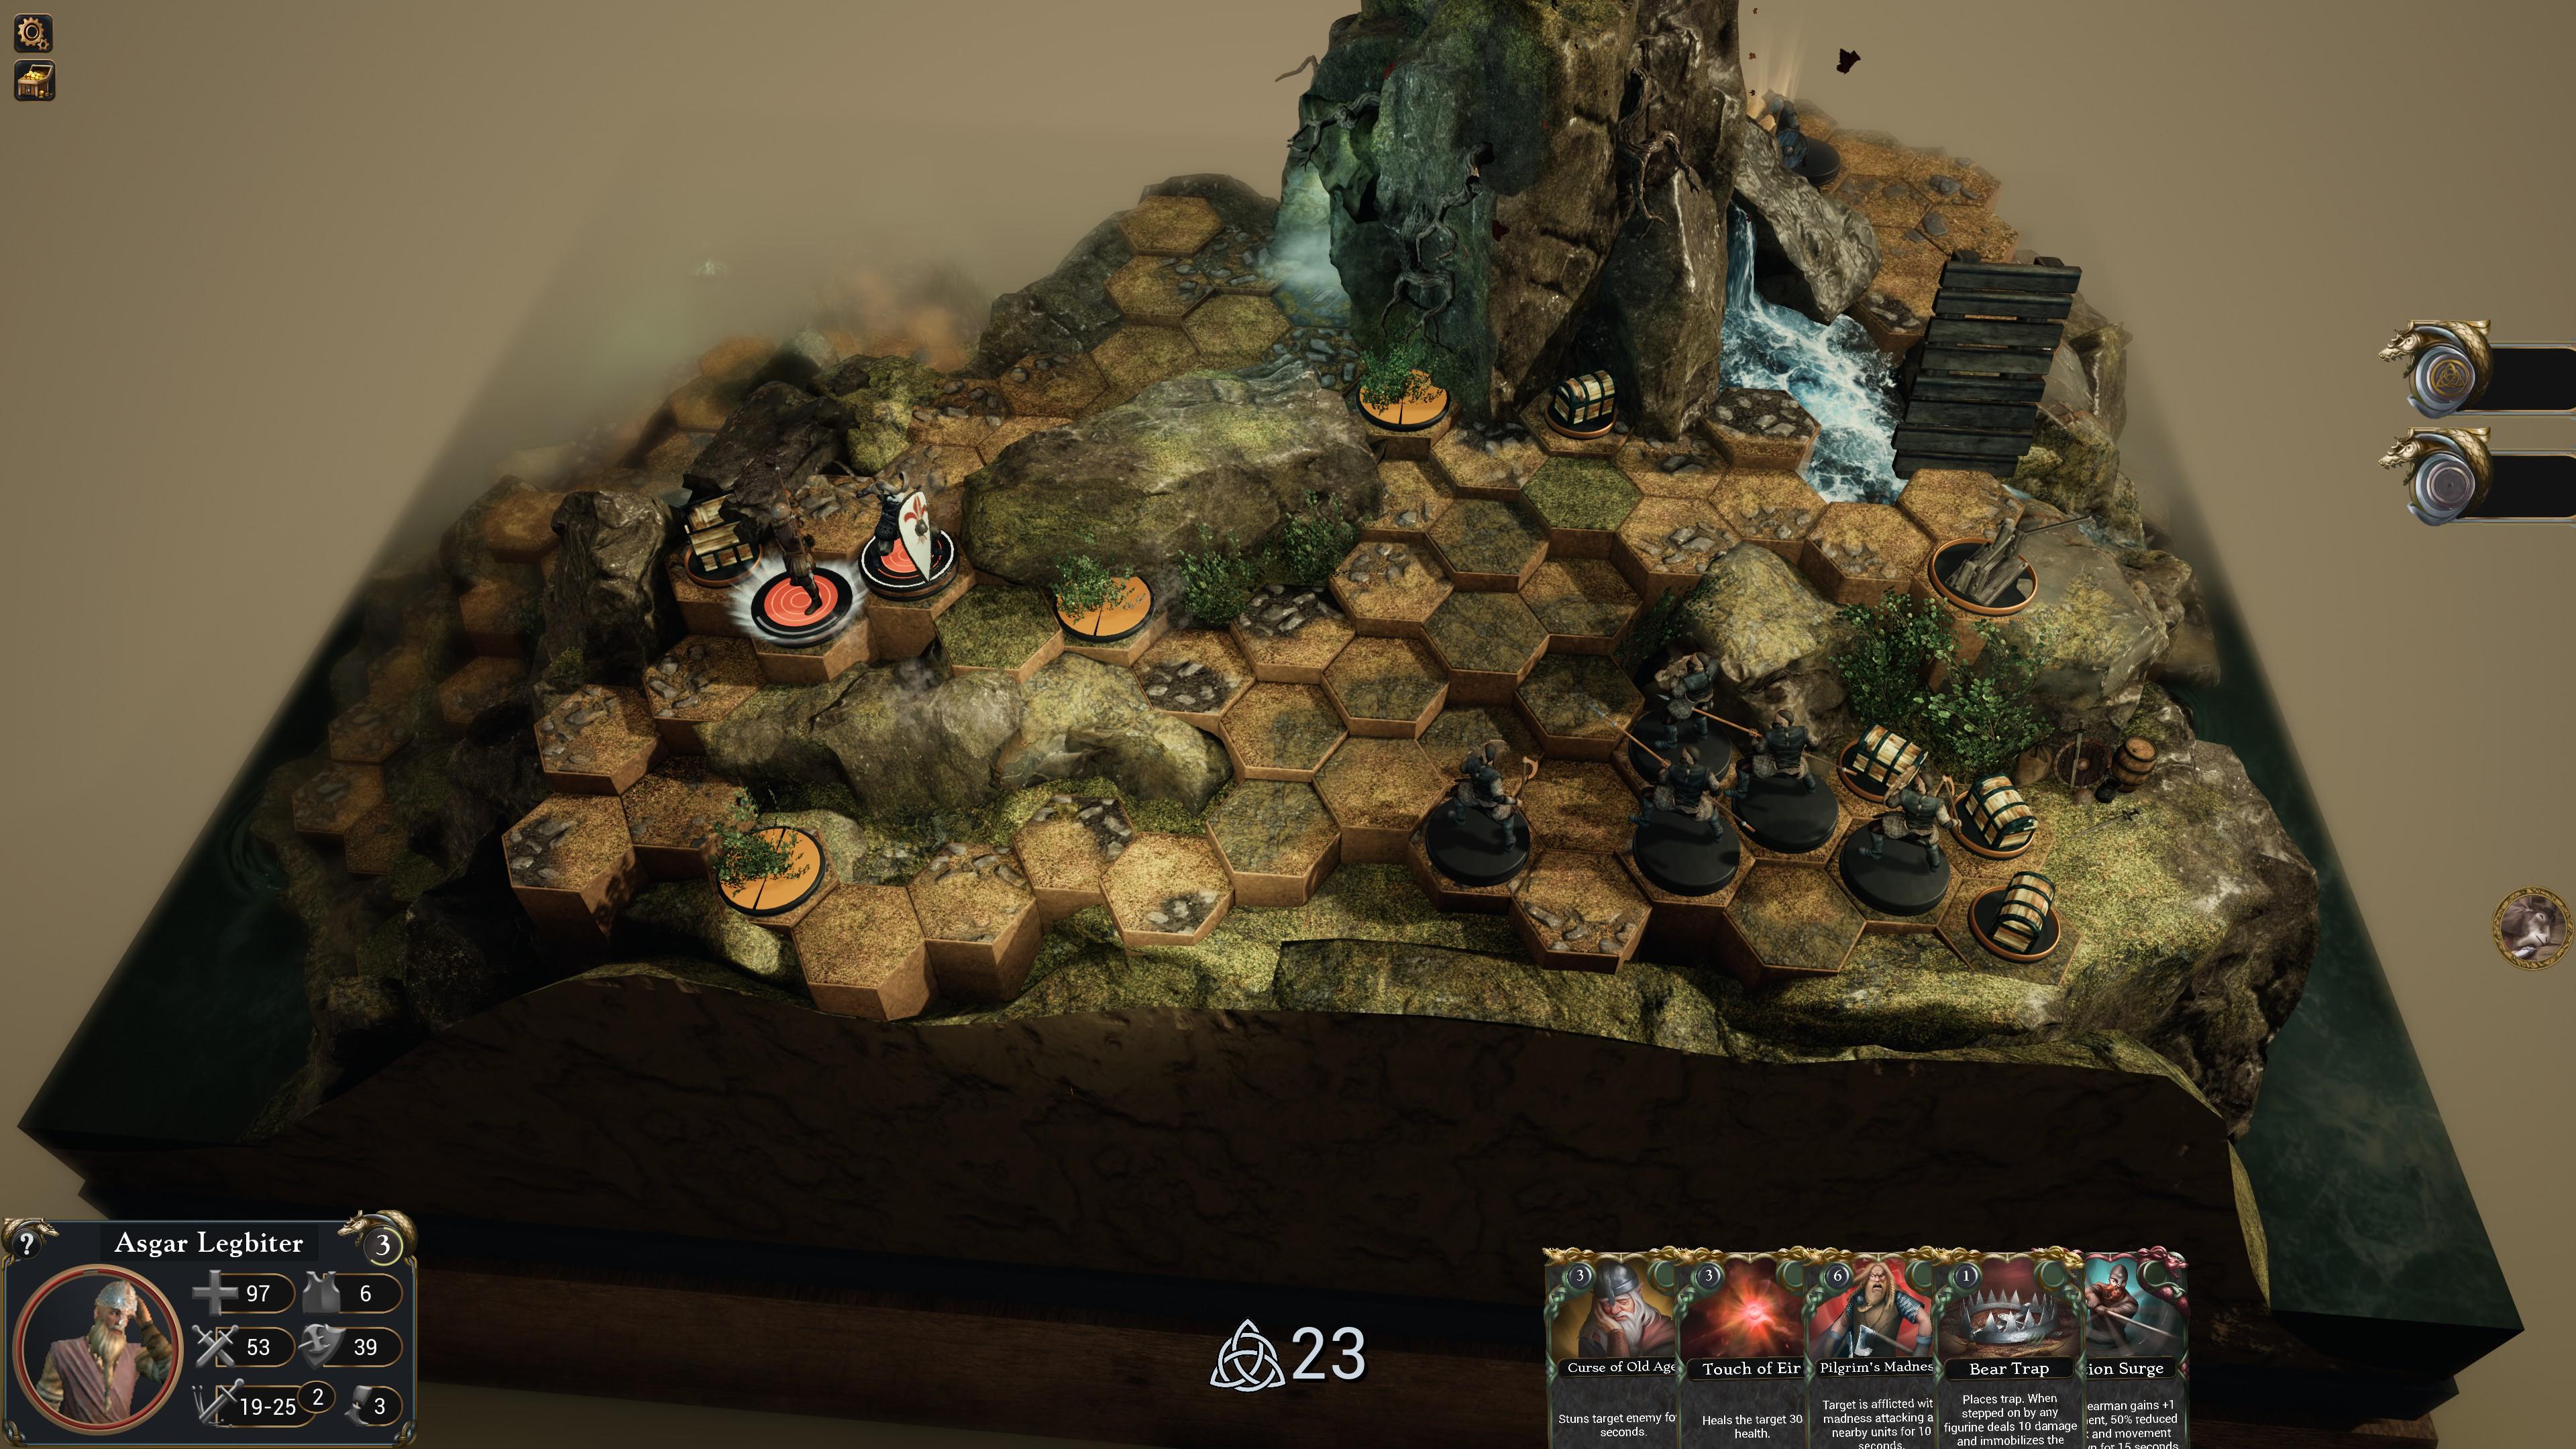 An assault on bandits guarding treasure